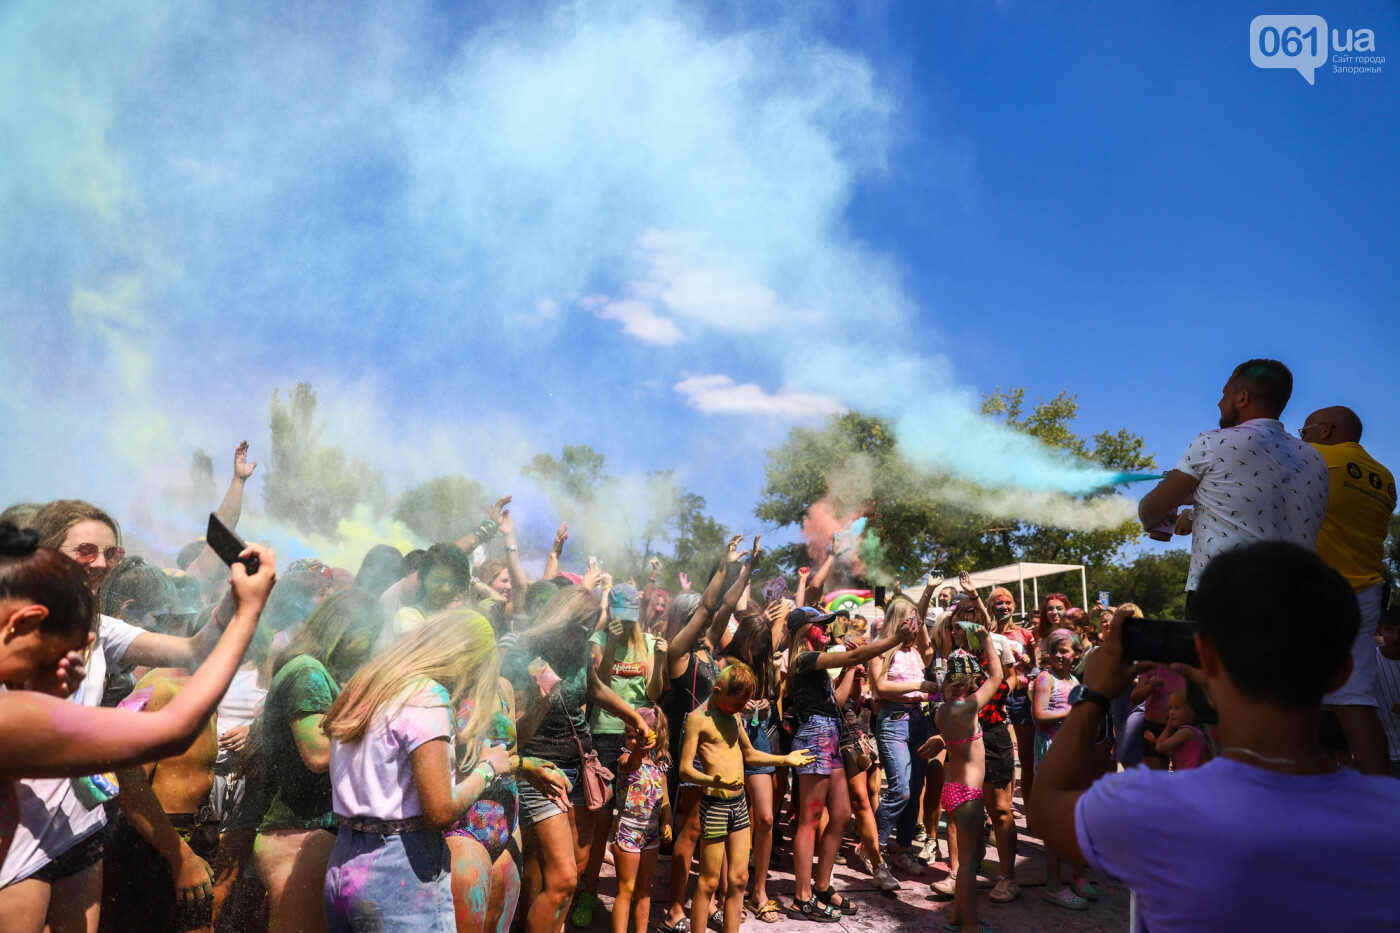 Сотни запорожцев приняли участие в фестивале красок Холи, - ФОТОРЕПОРТАЖ, фото-16